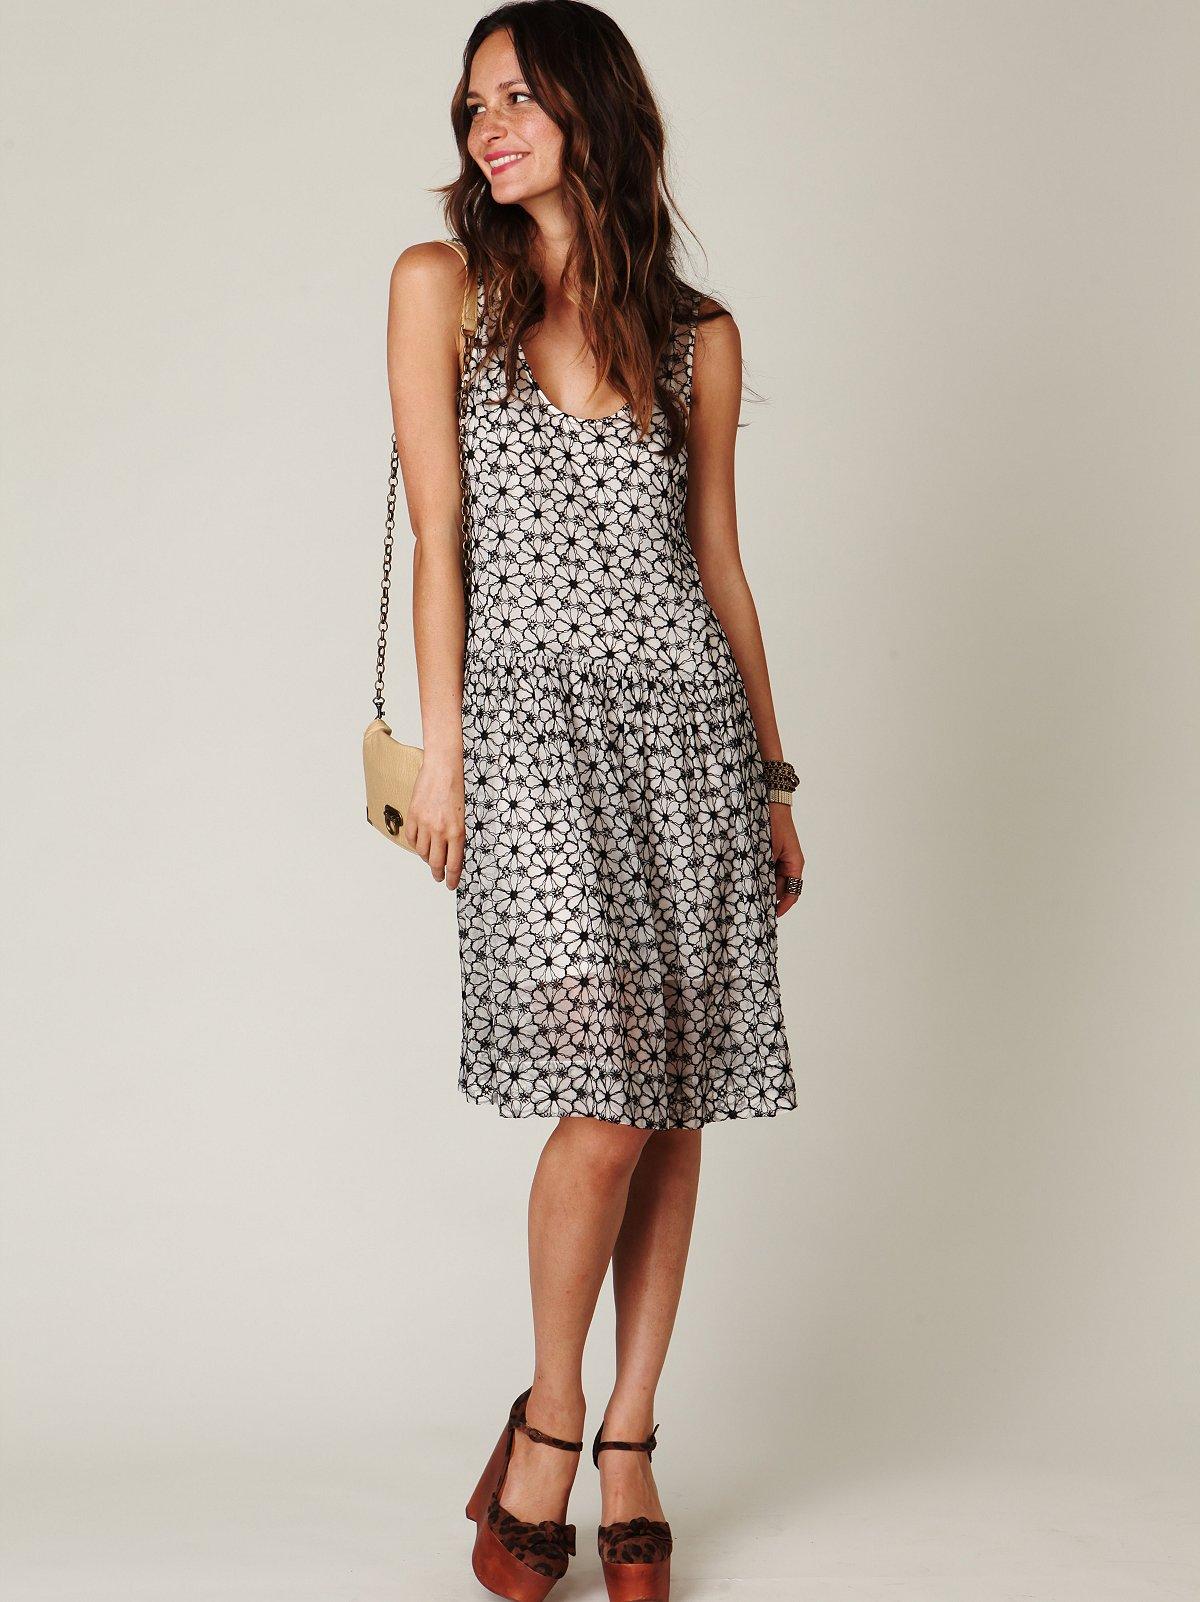 Sheer Tea Length Tank Dress